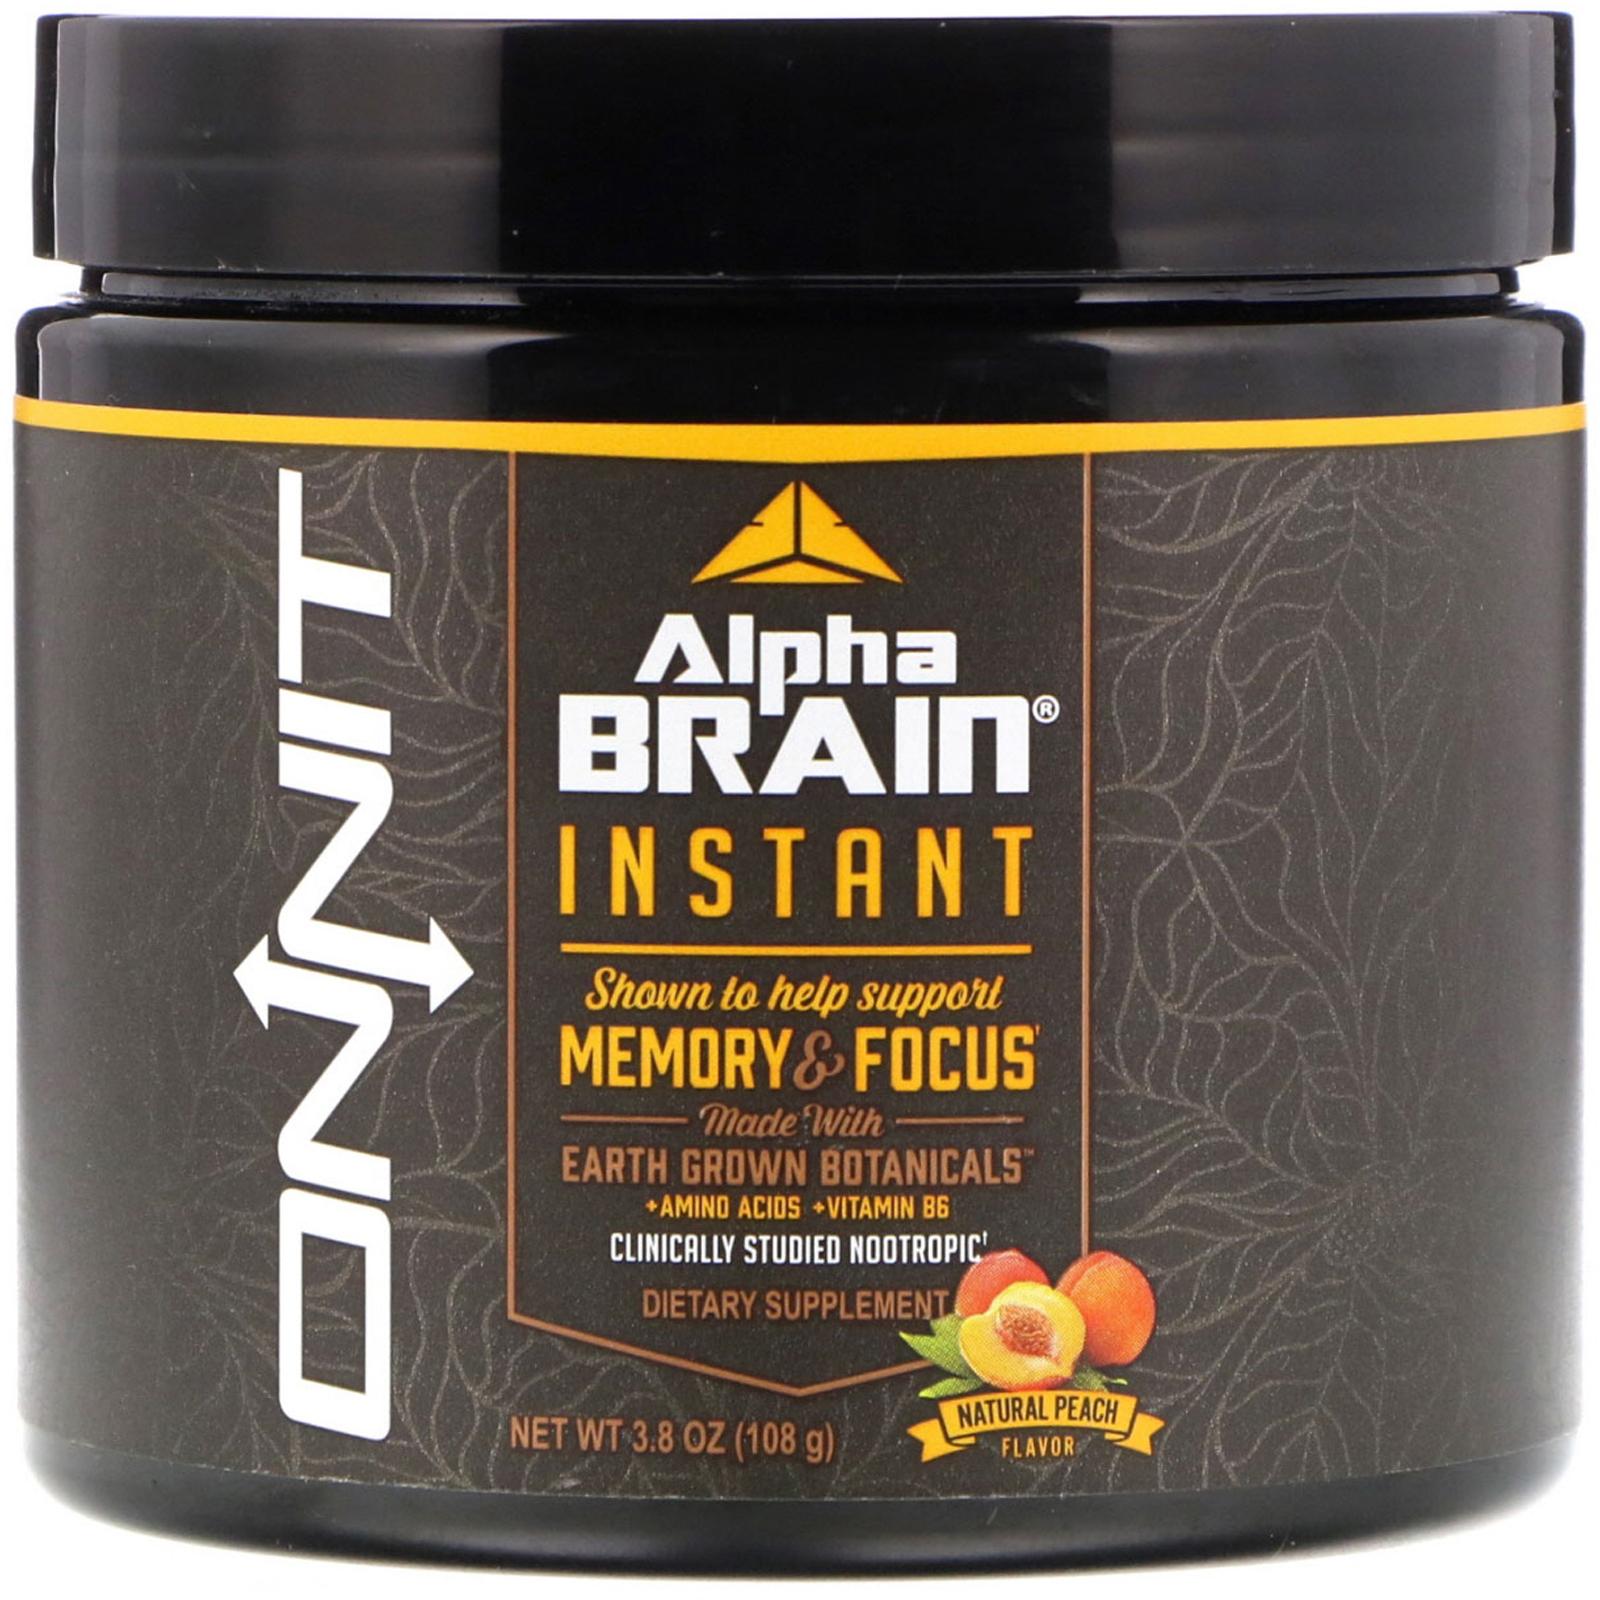 Onnit Alpha Brain Instant Memory Focus Natural Peach Flavor